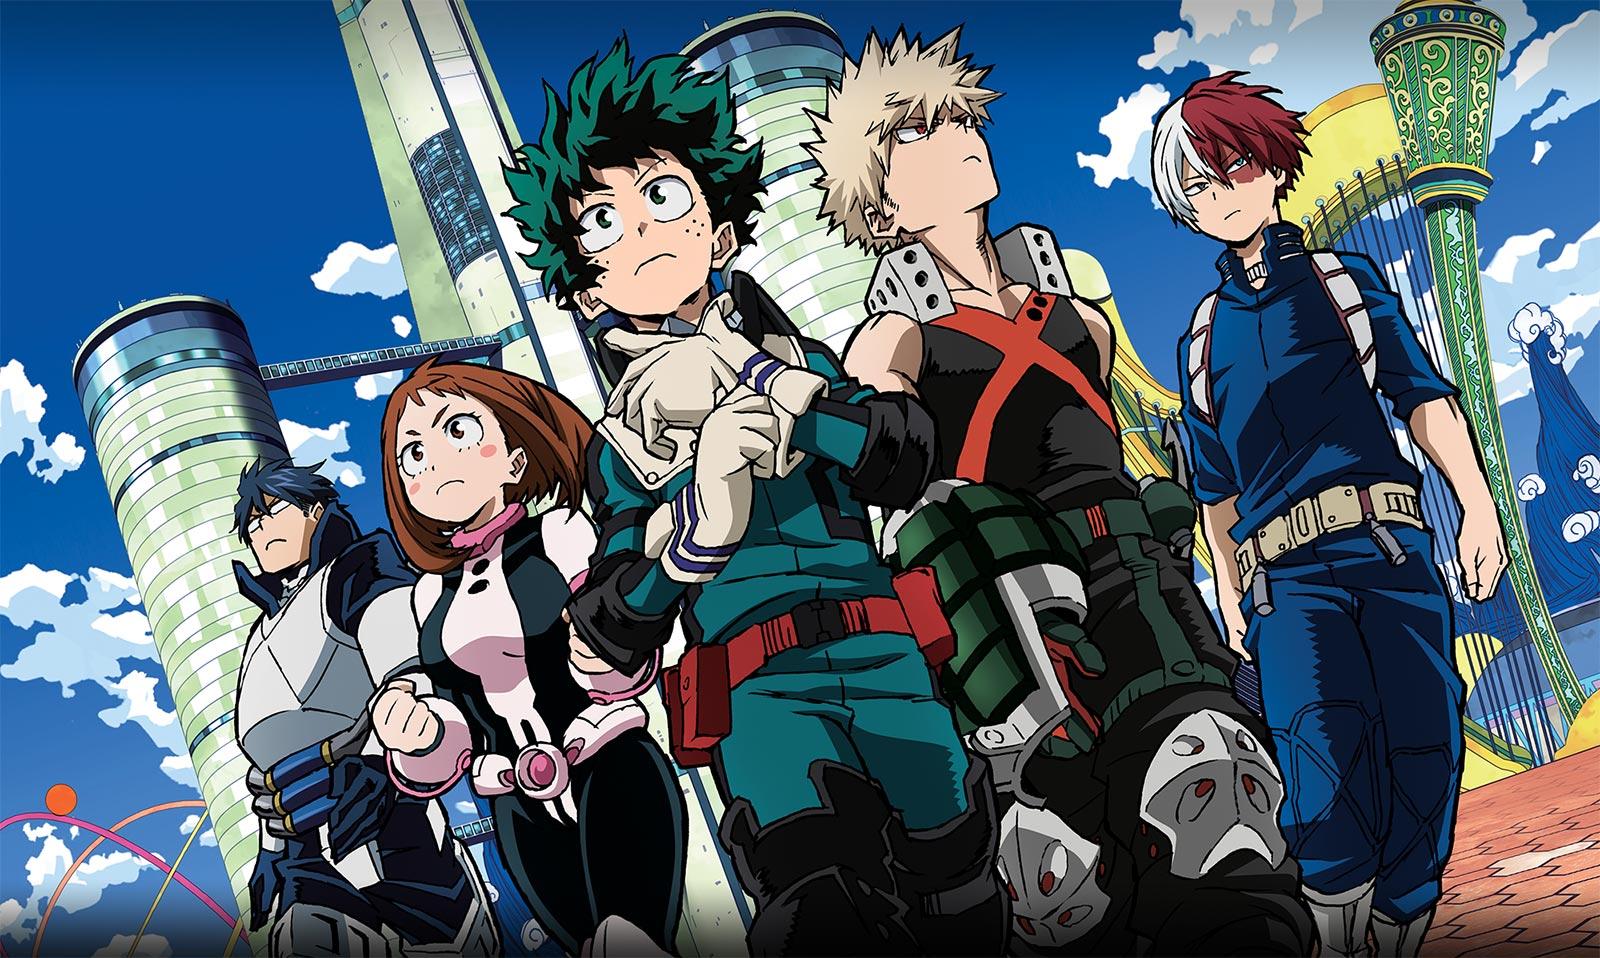 From Left, Iida, Ochako, Midorya, Bakugo, Todoroki - in their hero outfits on I-Island.